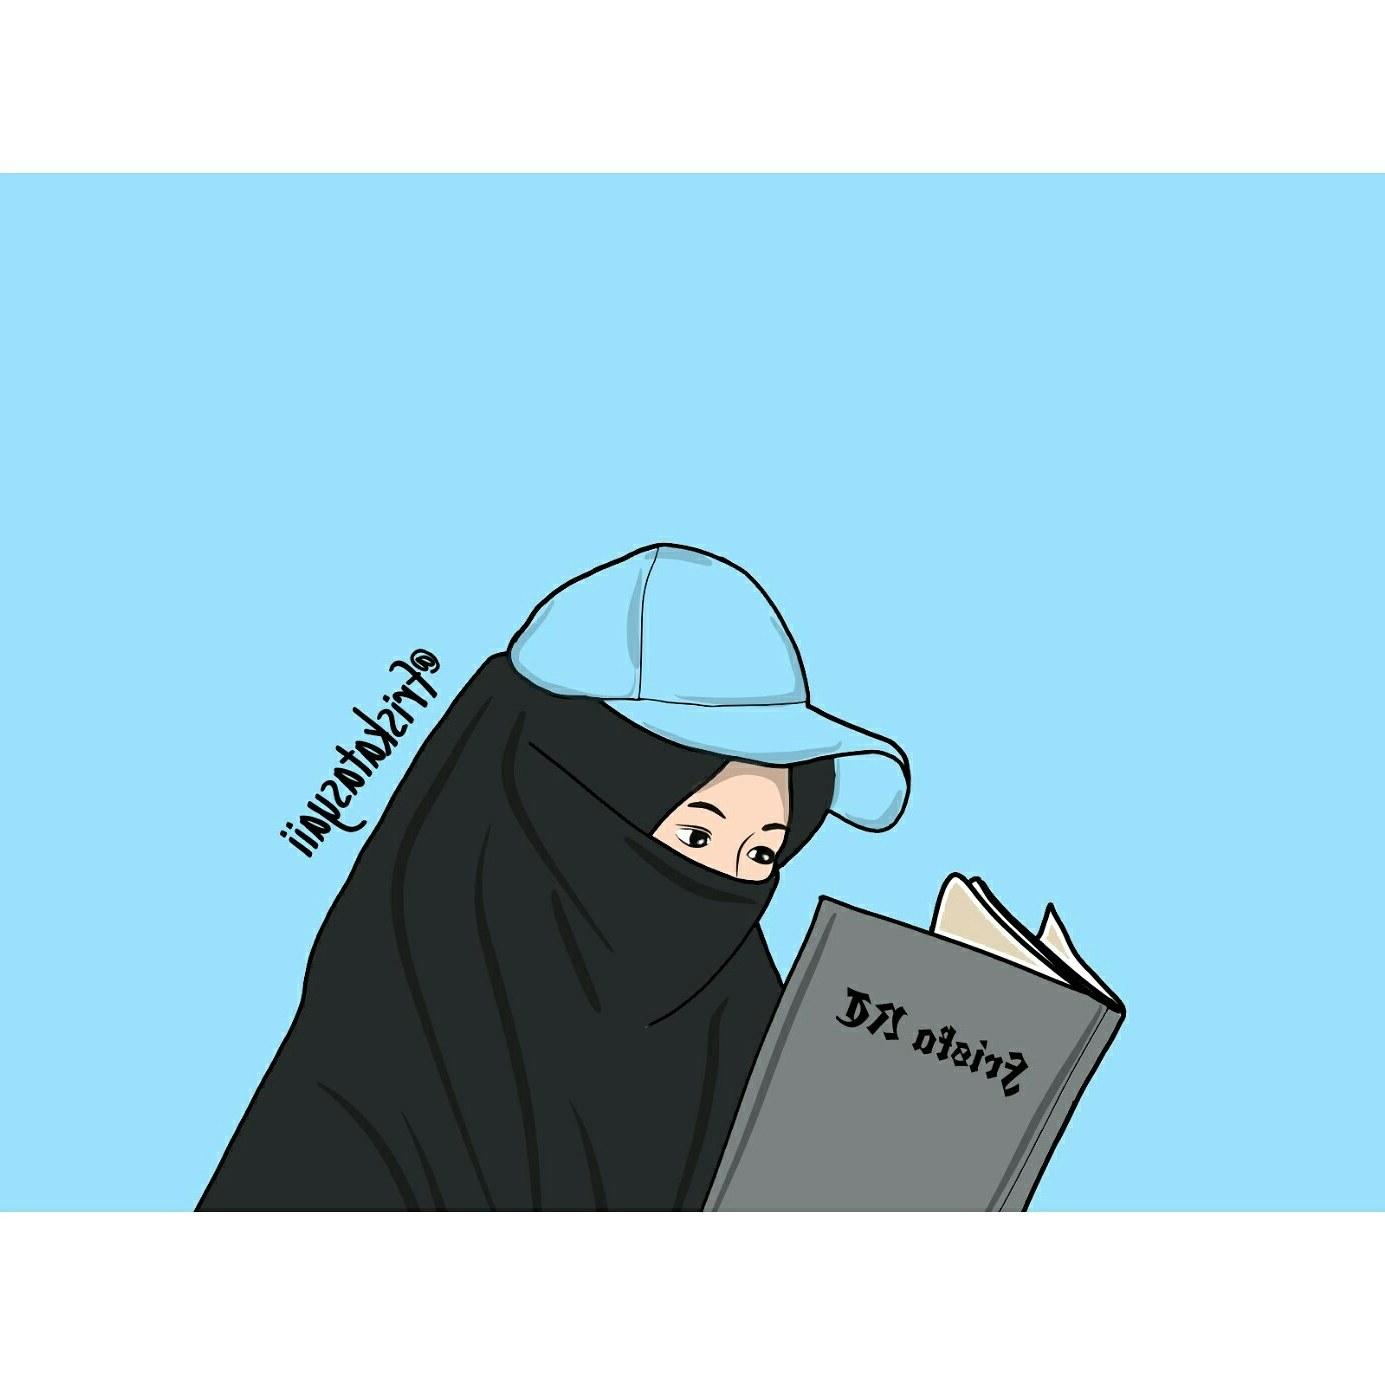 Inspirasi Muslimah Kartun Lucu O2d5 Gambar Kartun Belajar Membaca Keren